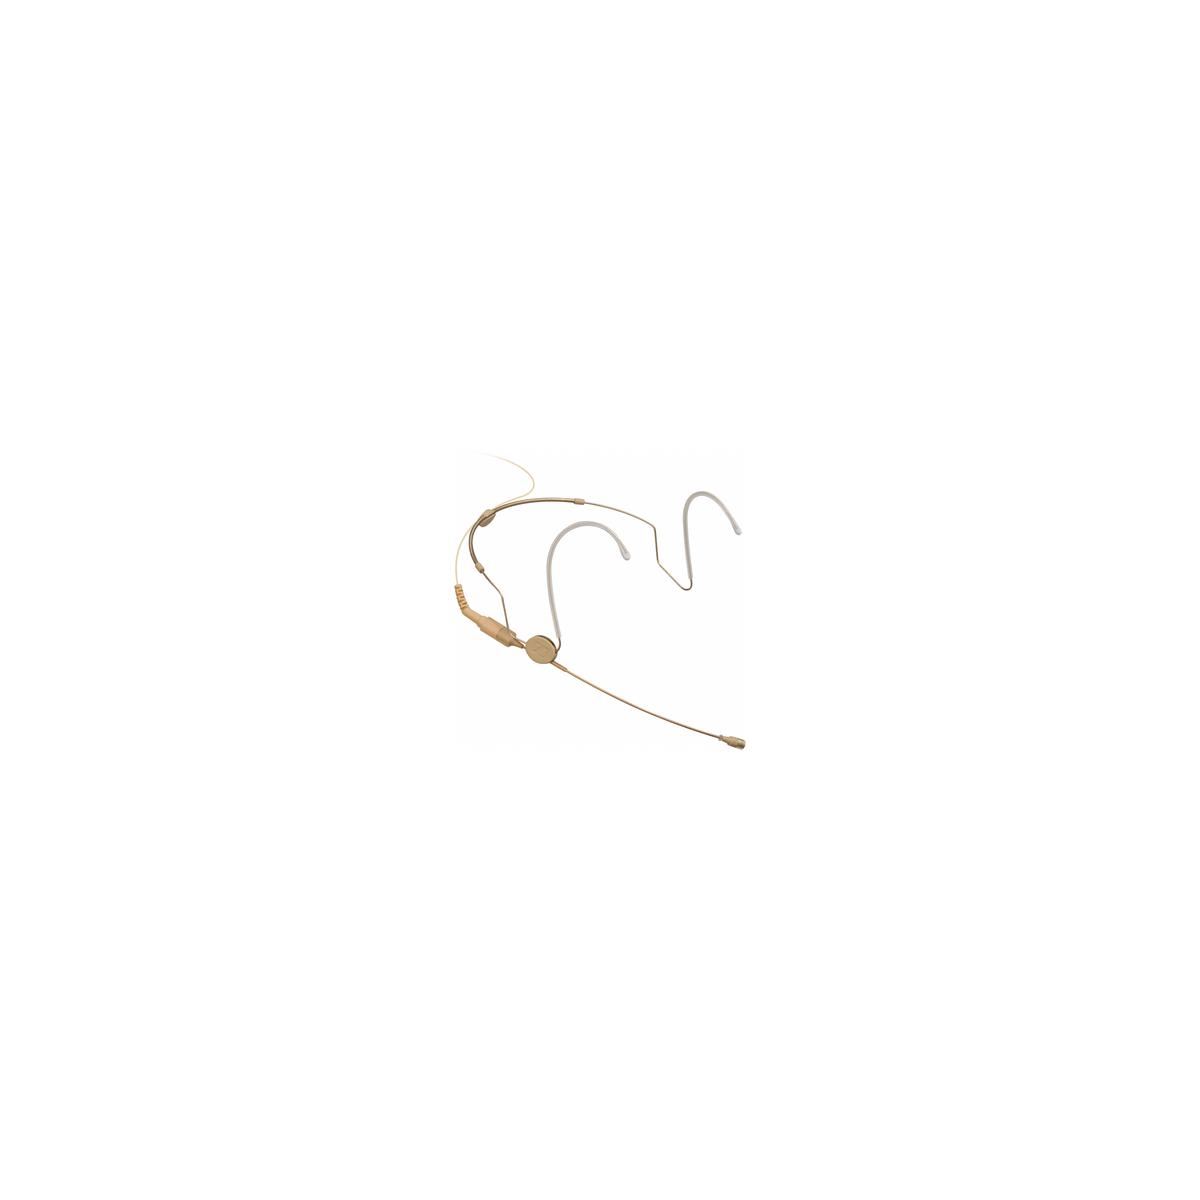 Micros serre-tête - Sennheiser - HSP 2-EW 3